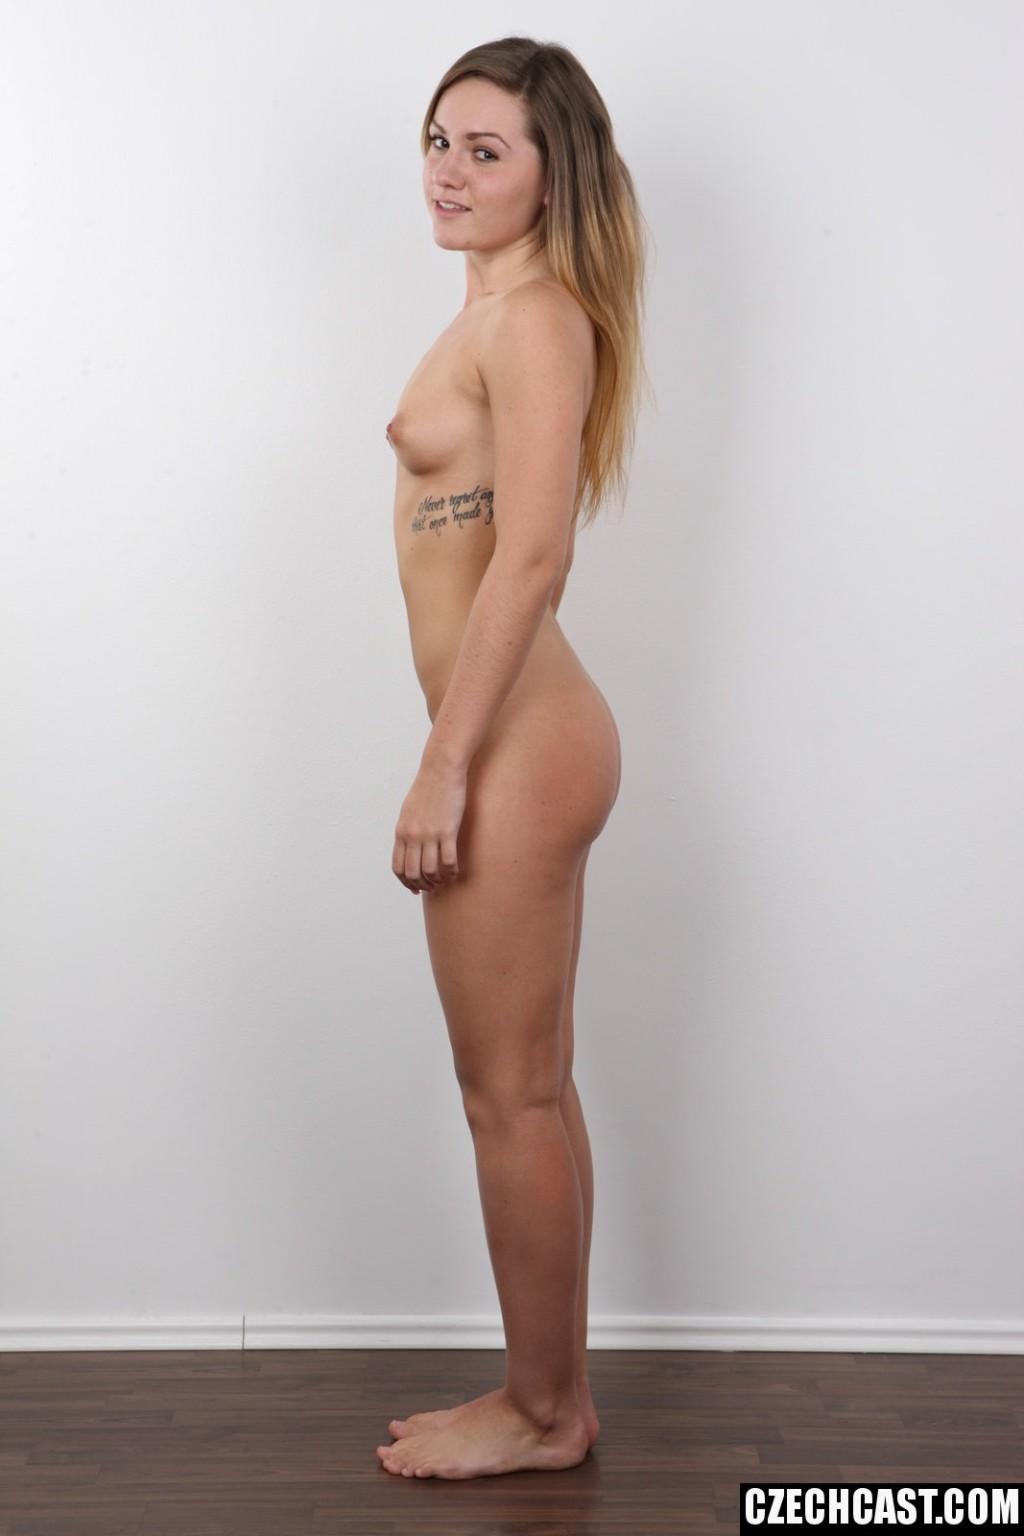 Чешка Сара стоит голая на порно кастинге